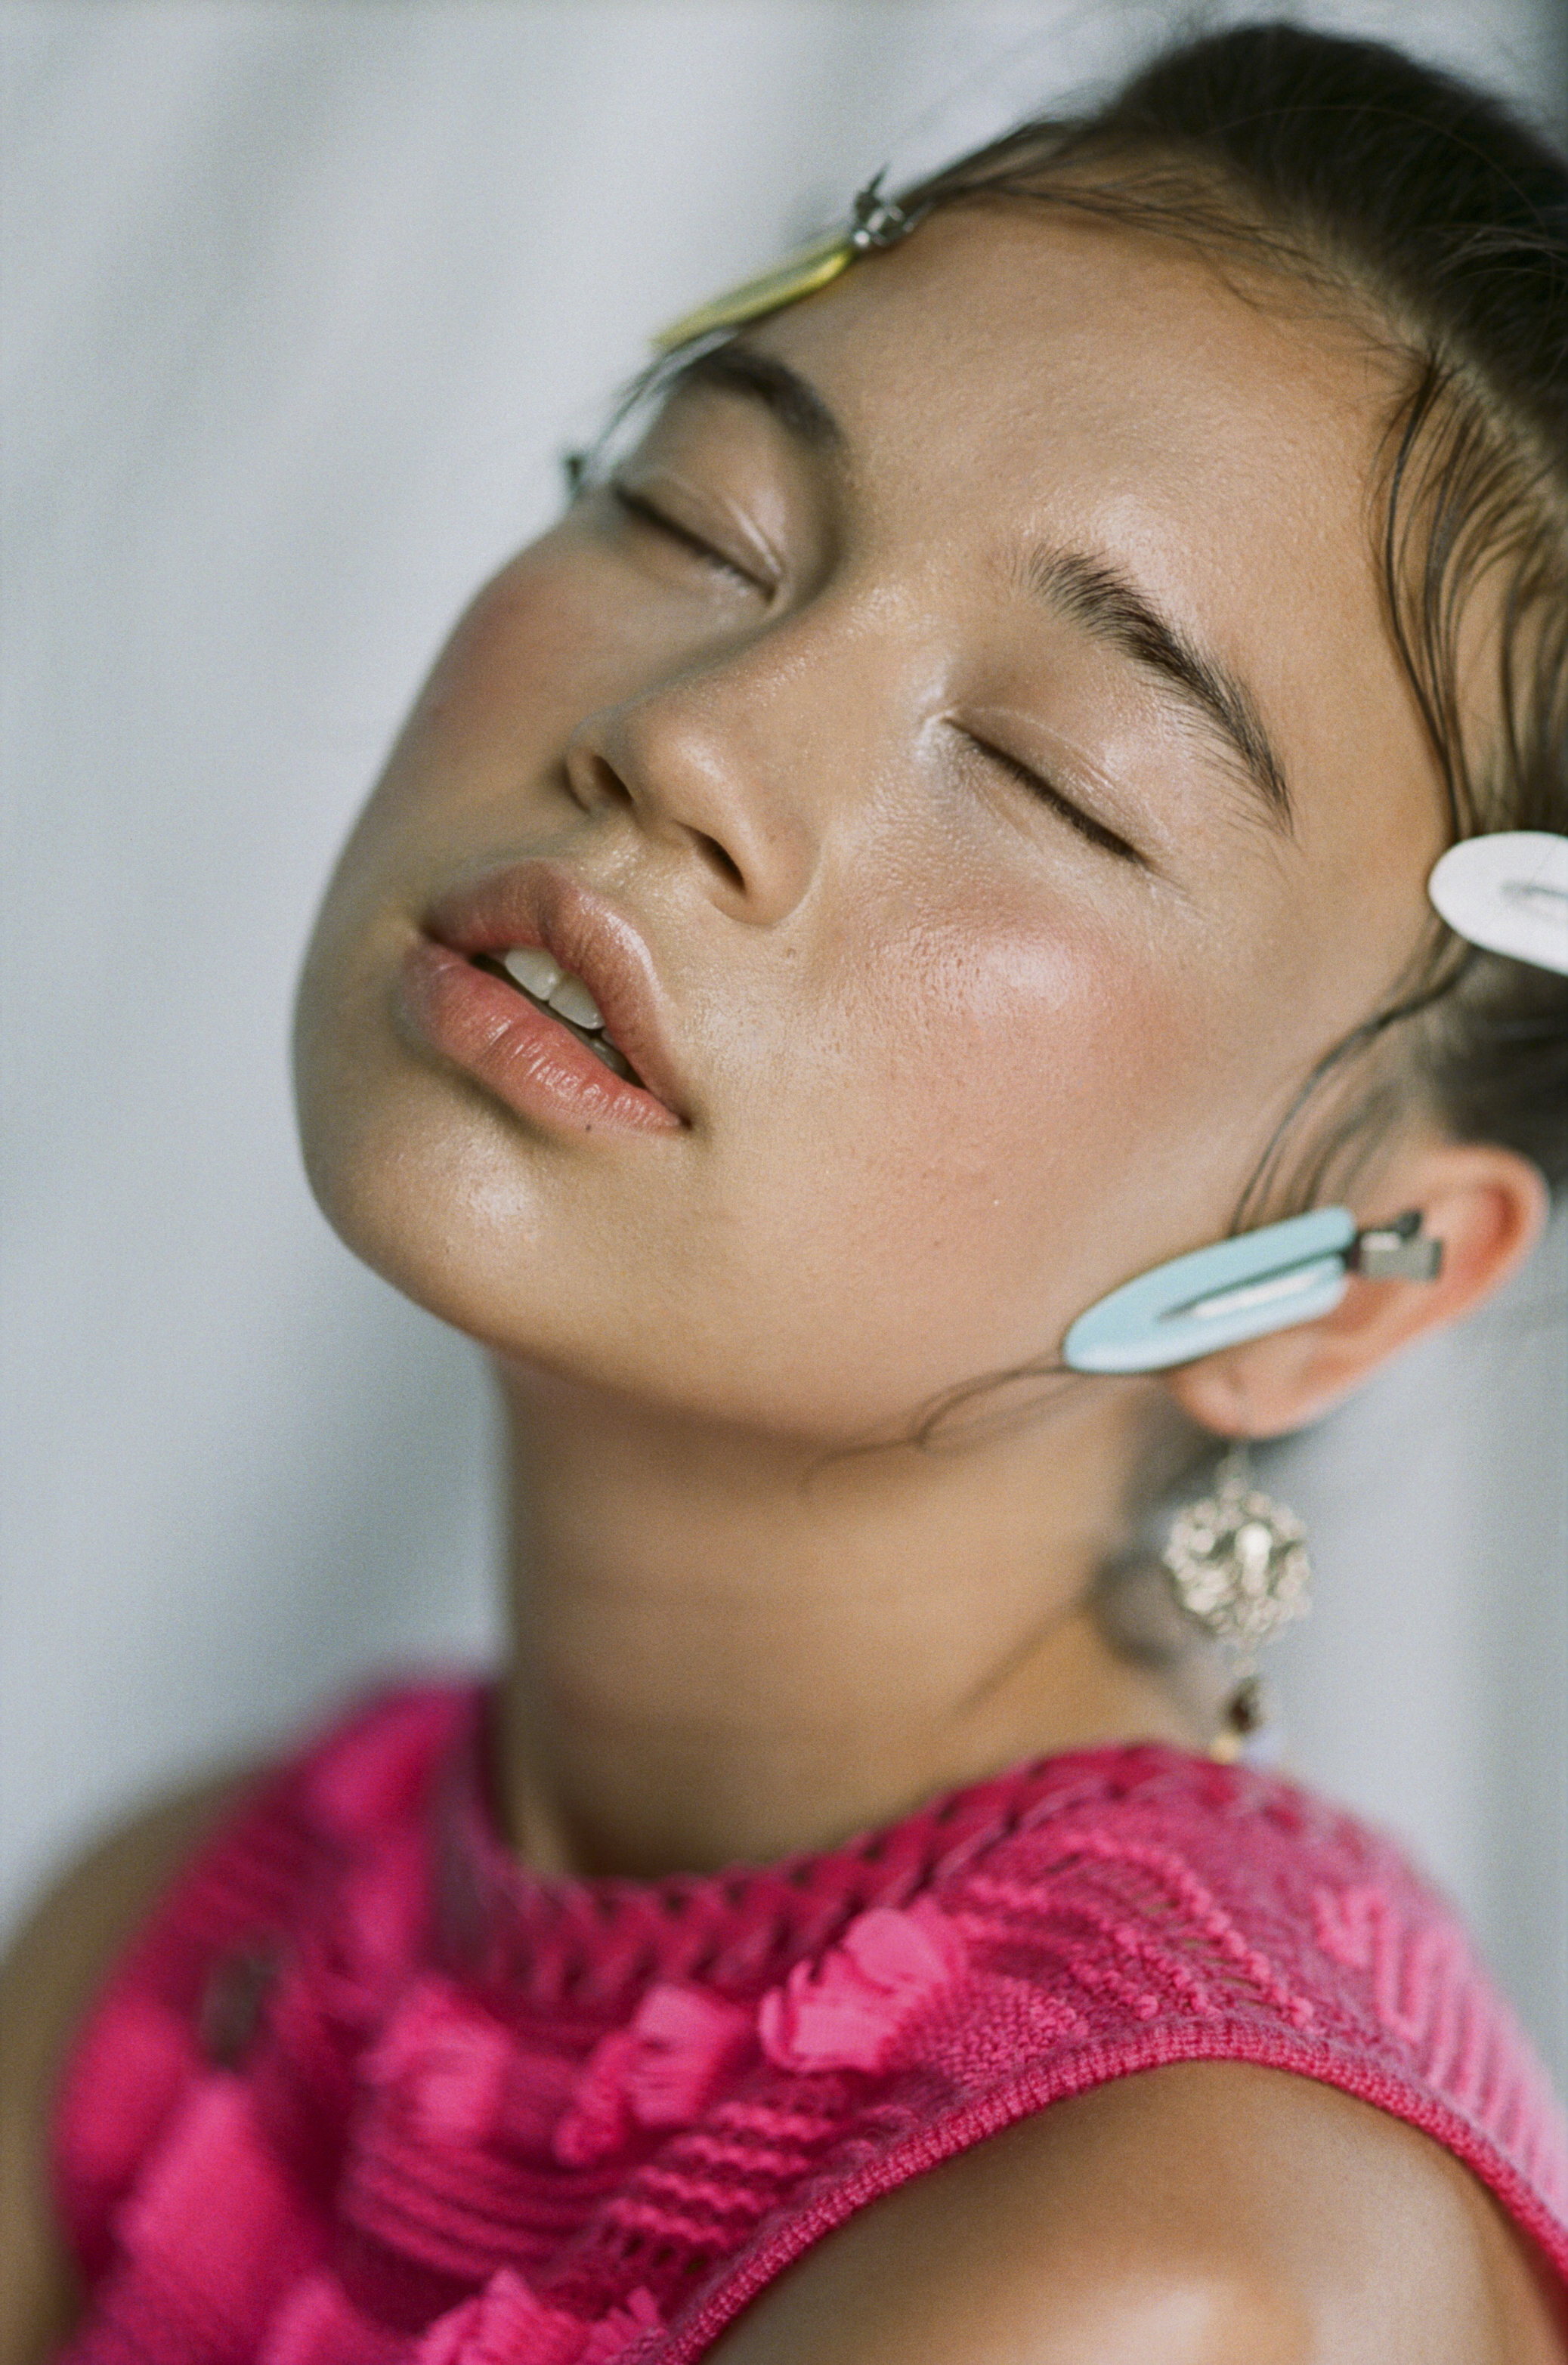 Image: Stephanie Sian Smith | Makeup Artist: Khandiz Joni | Hair: Betty Bee | Model: Teagan at Milk Model Management